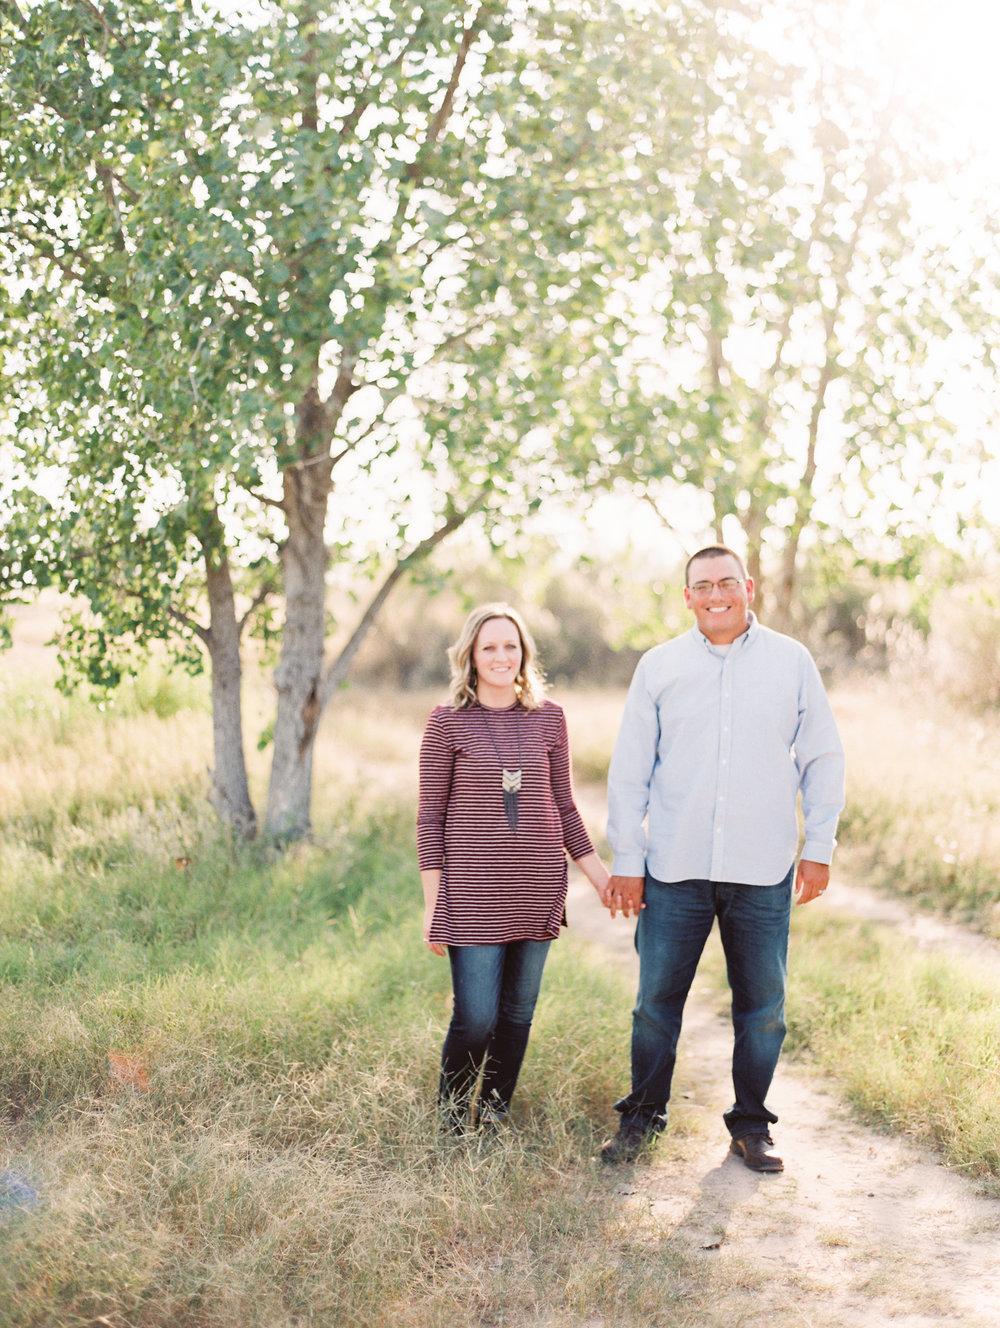 The Wilburn Family | Britni Dean Photography | Texas Film Family Photographer